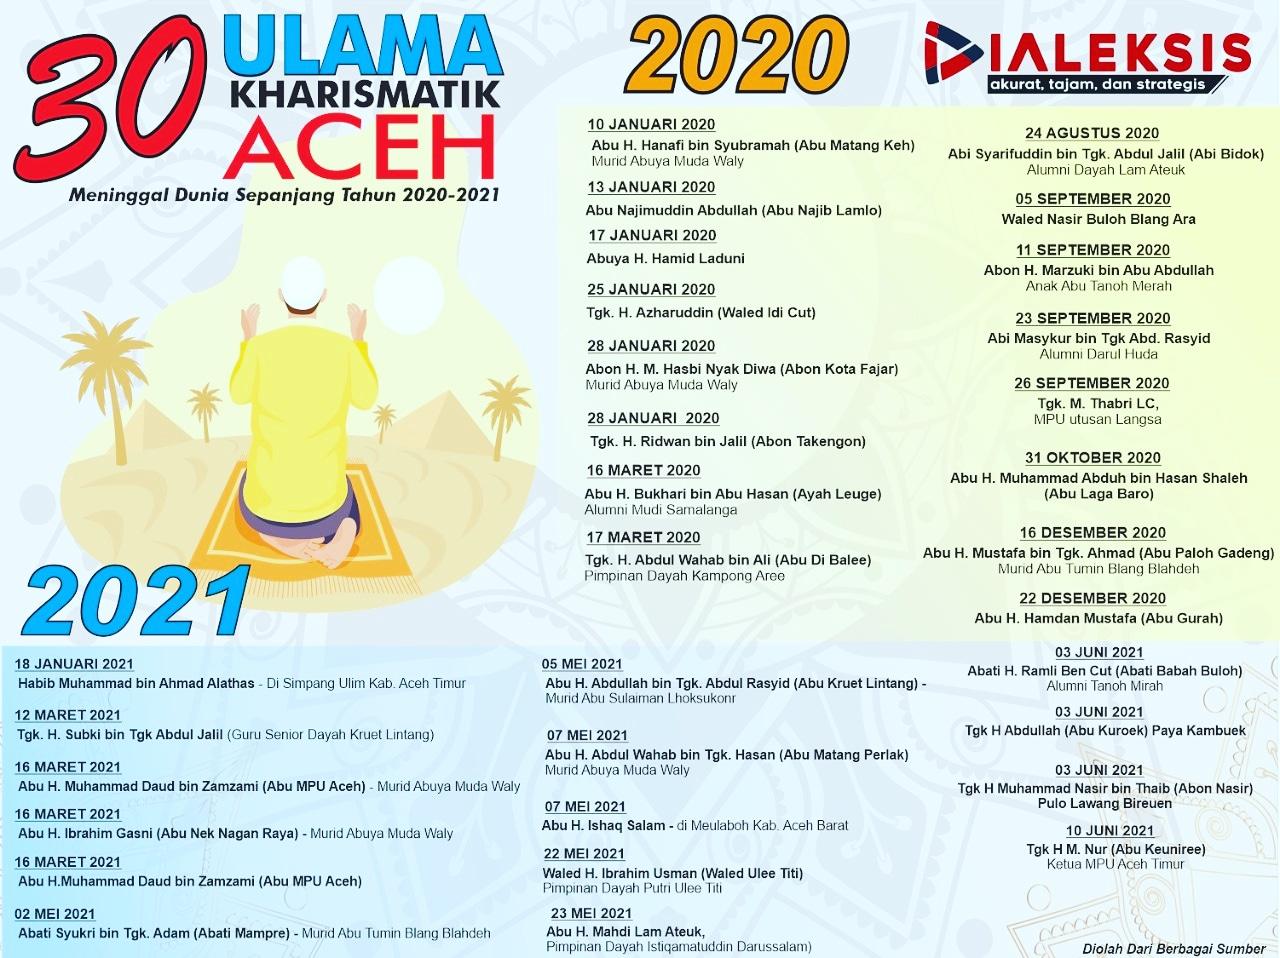 30 Ulama Kharismatik Aceh Meninggal Dunia Sepanjang 2020- 2021